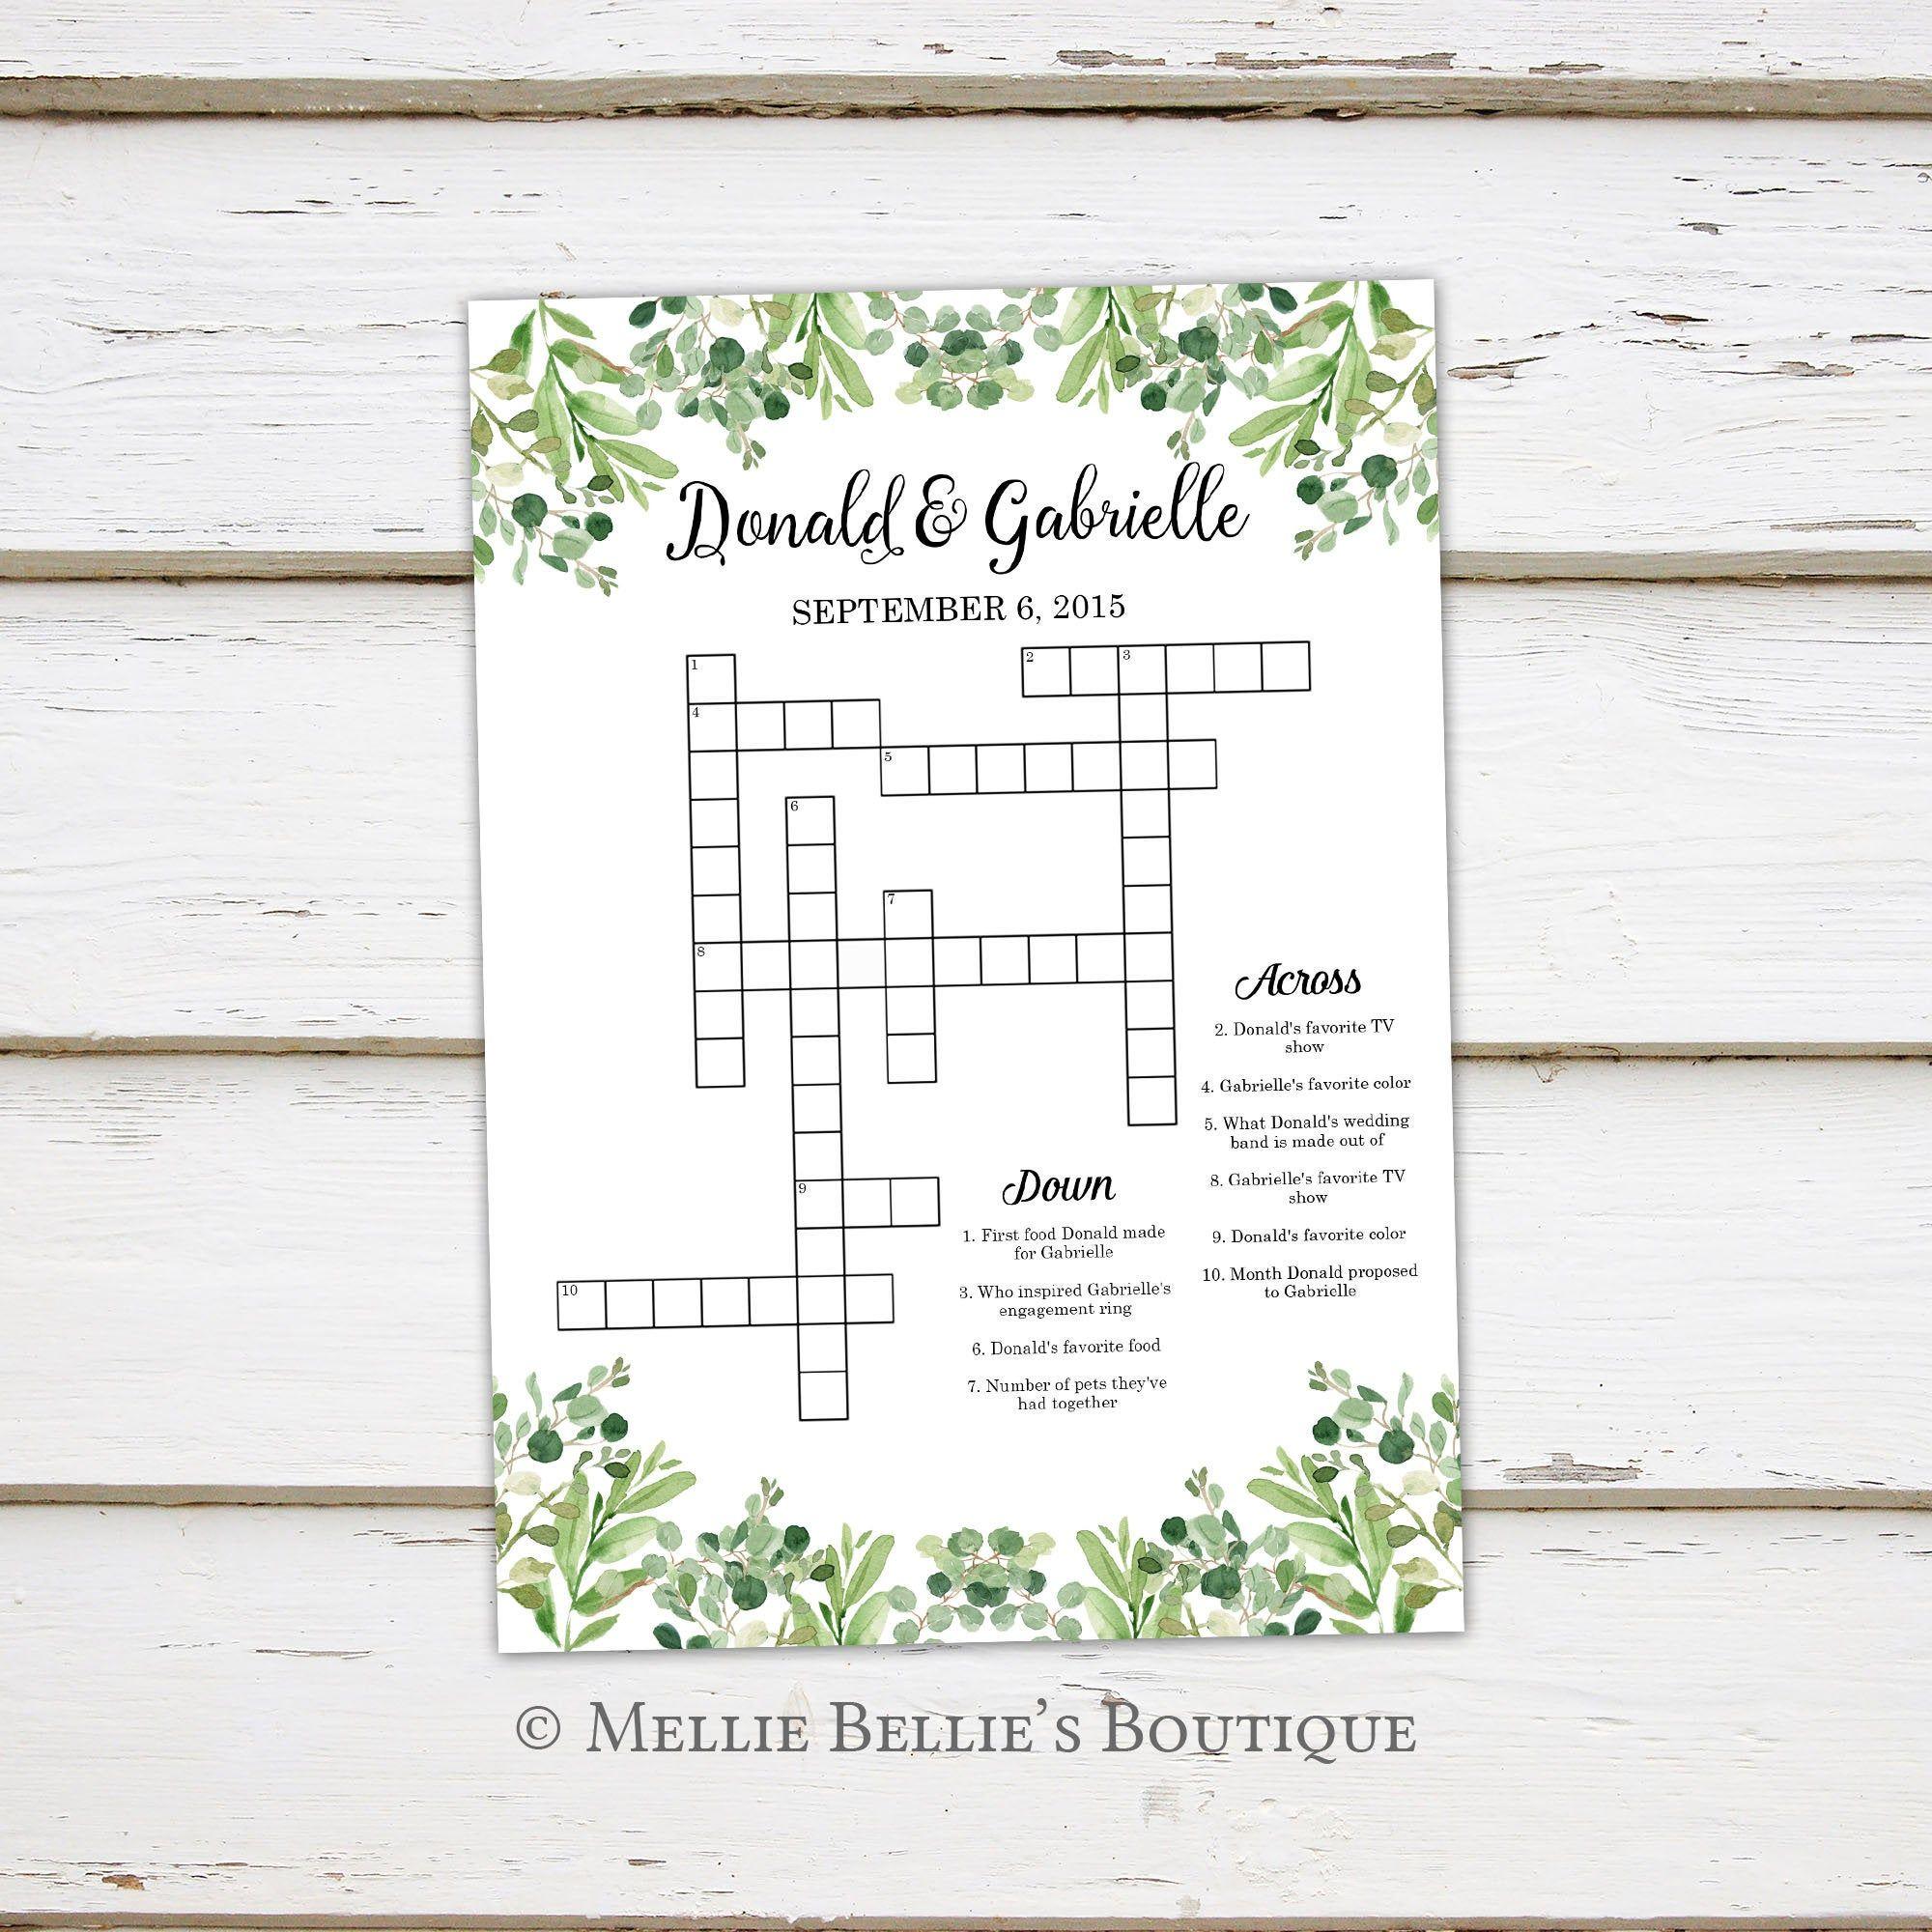 Printable Wedding Crossword Puzzle Game Games For Wedding Etsy In 2020 Wedding Crossword Puzzle Wedding Printables Crossword Puzzle